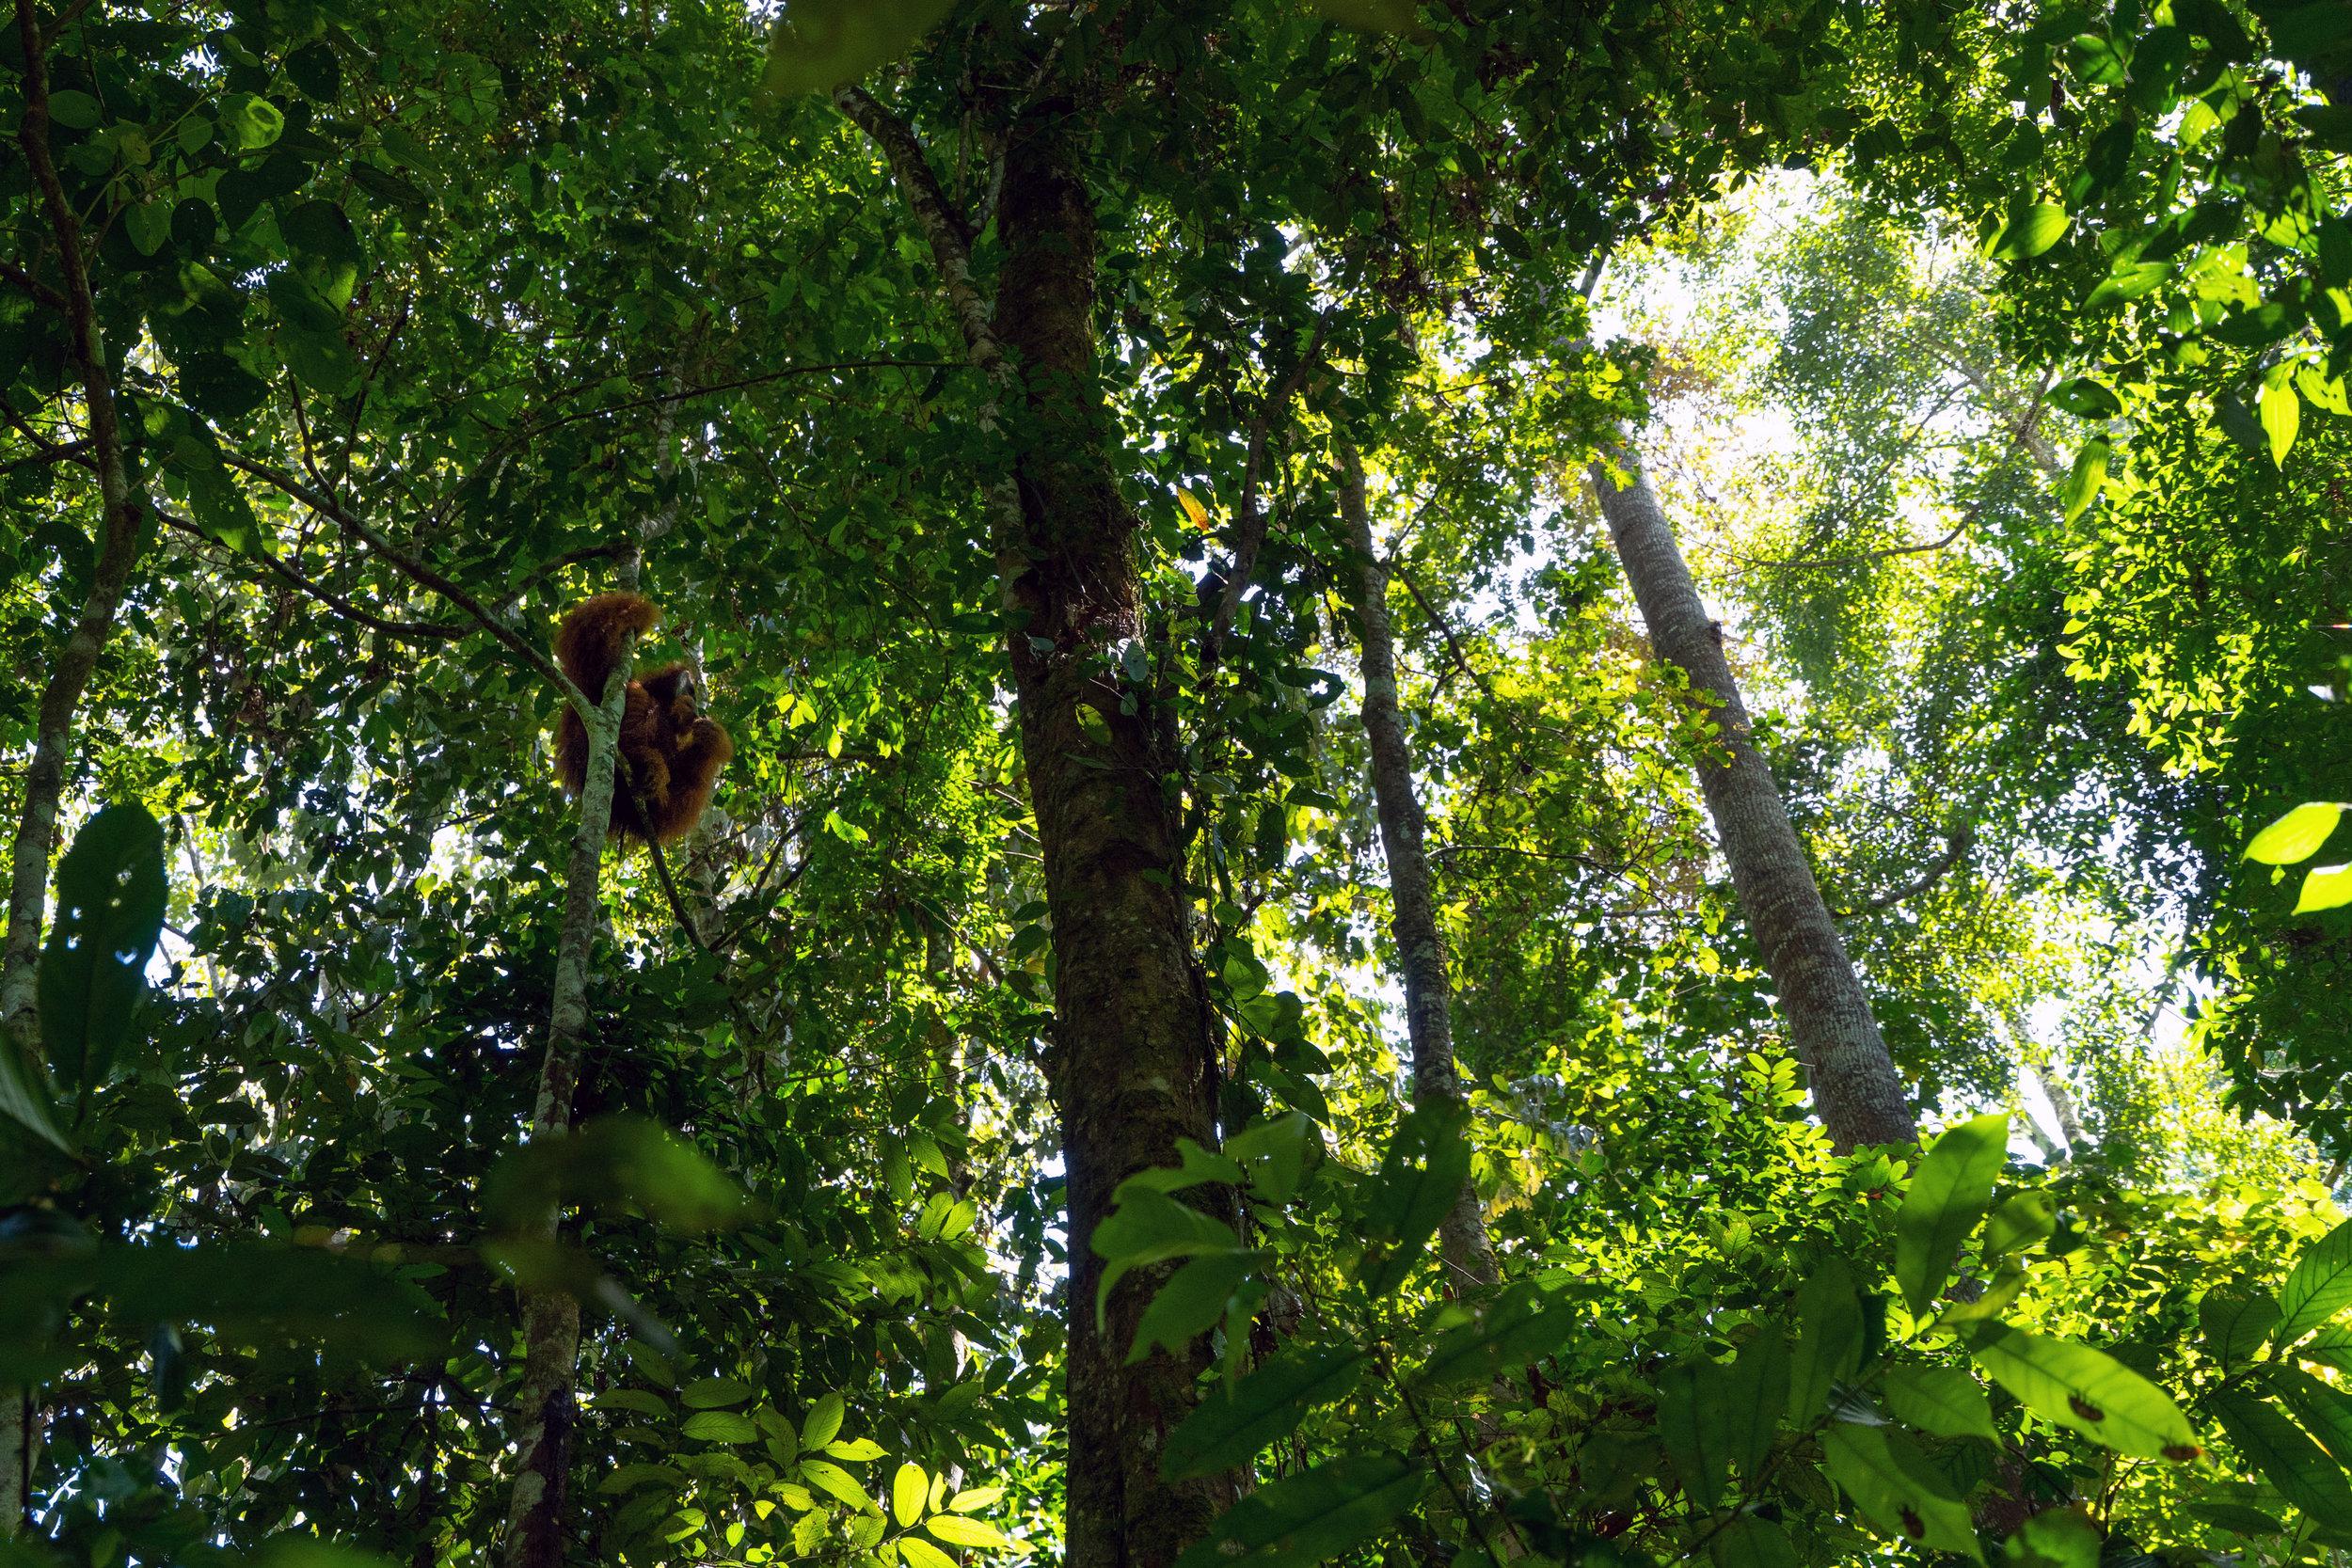 wild-orangutan-ketambe-sumatra-indonesia-trekking-hiking-wildlife-trip-inertia-network-aceh.jpg